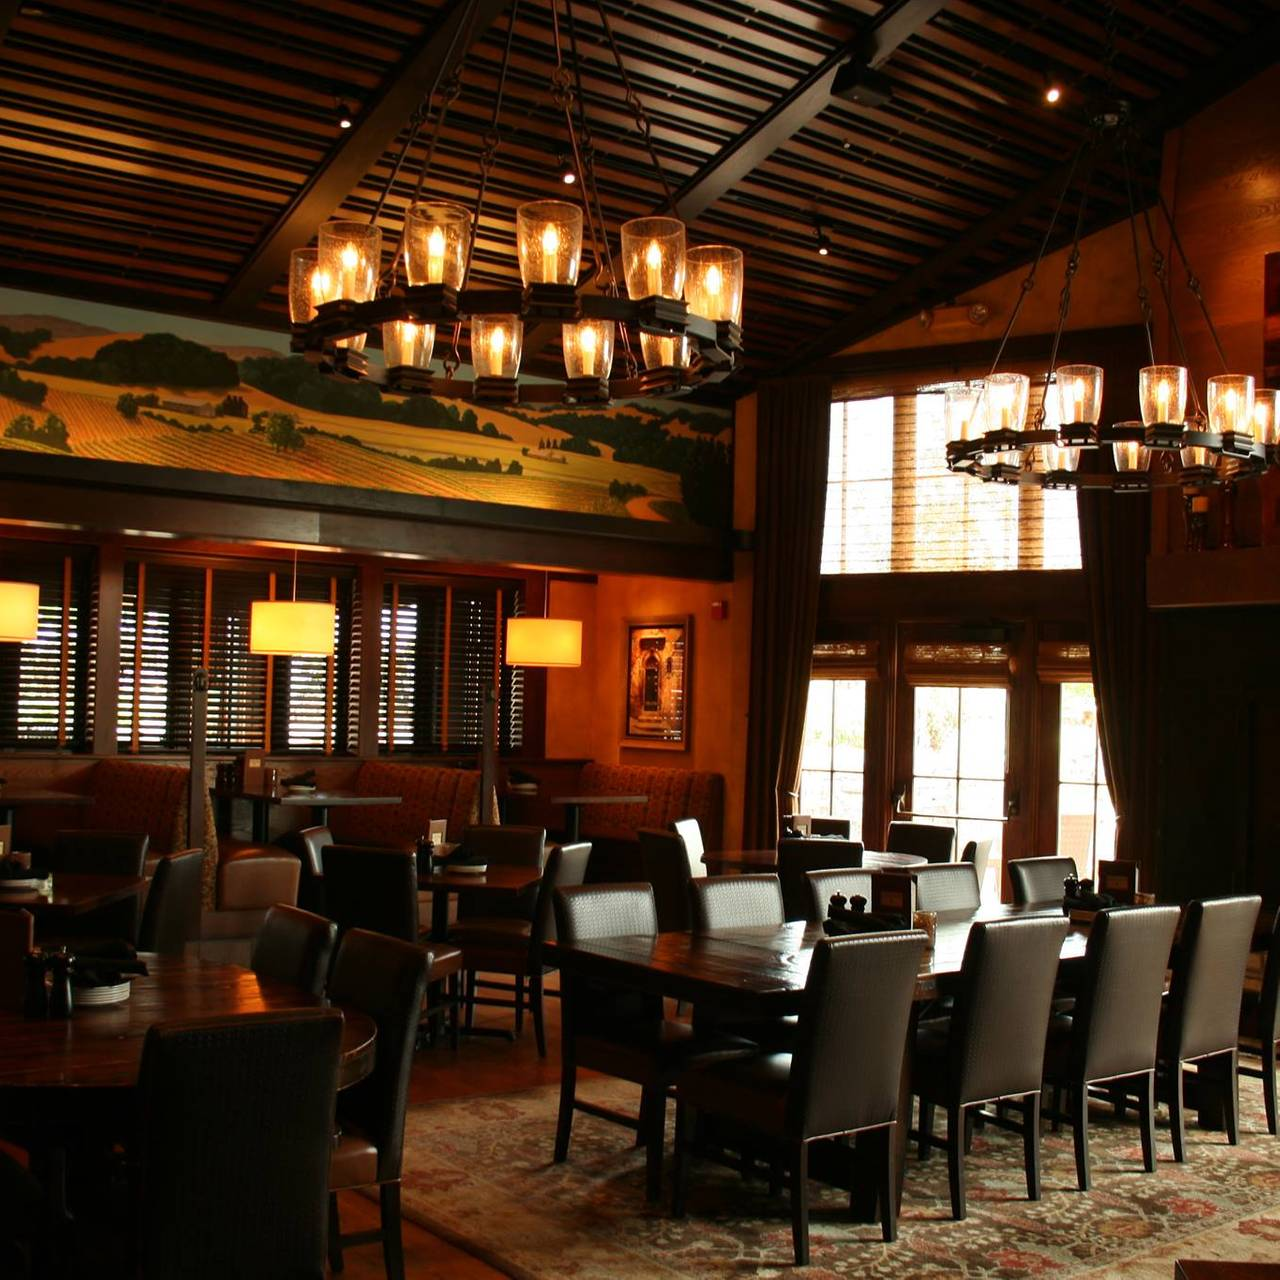 Porter Creek Hardwood Grilll Restaurant - Burnsville, MN | OpenTable